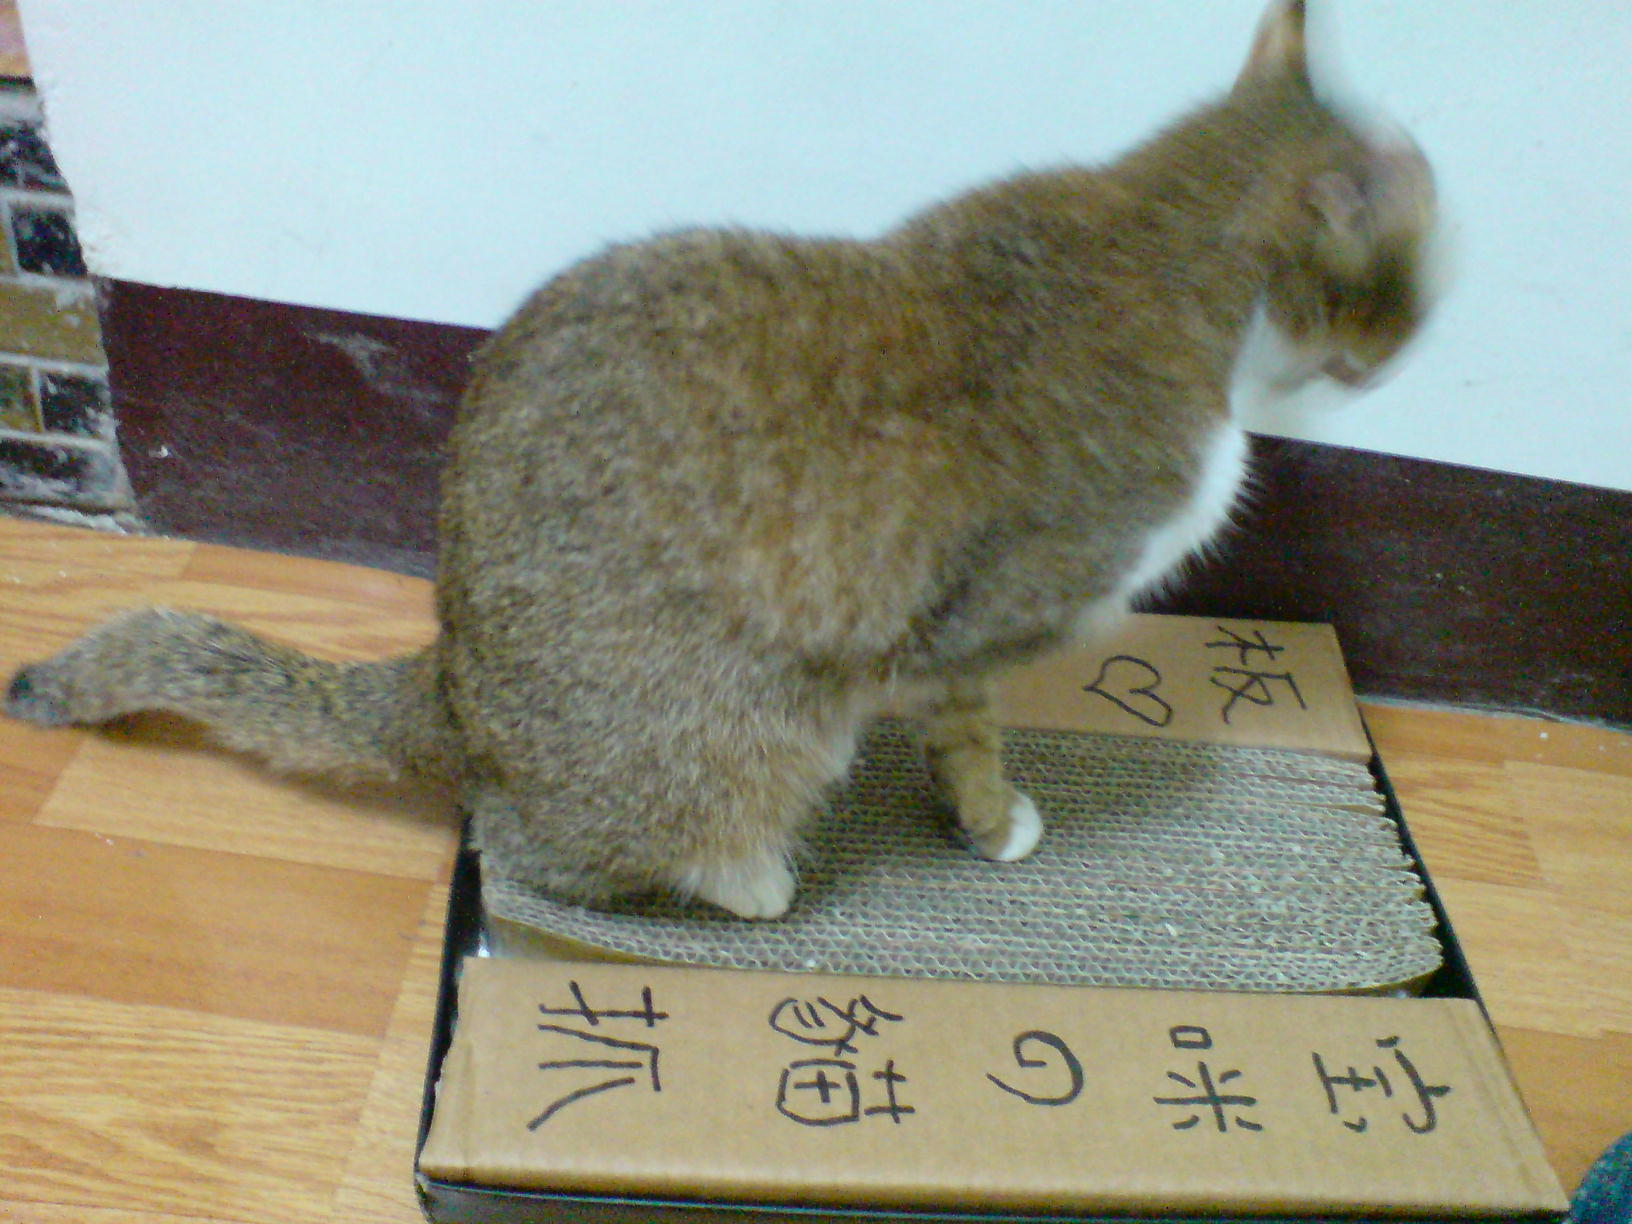 [diy]猫抓板diy | 可爱宠物的0.1毫米